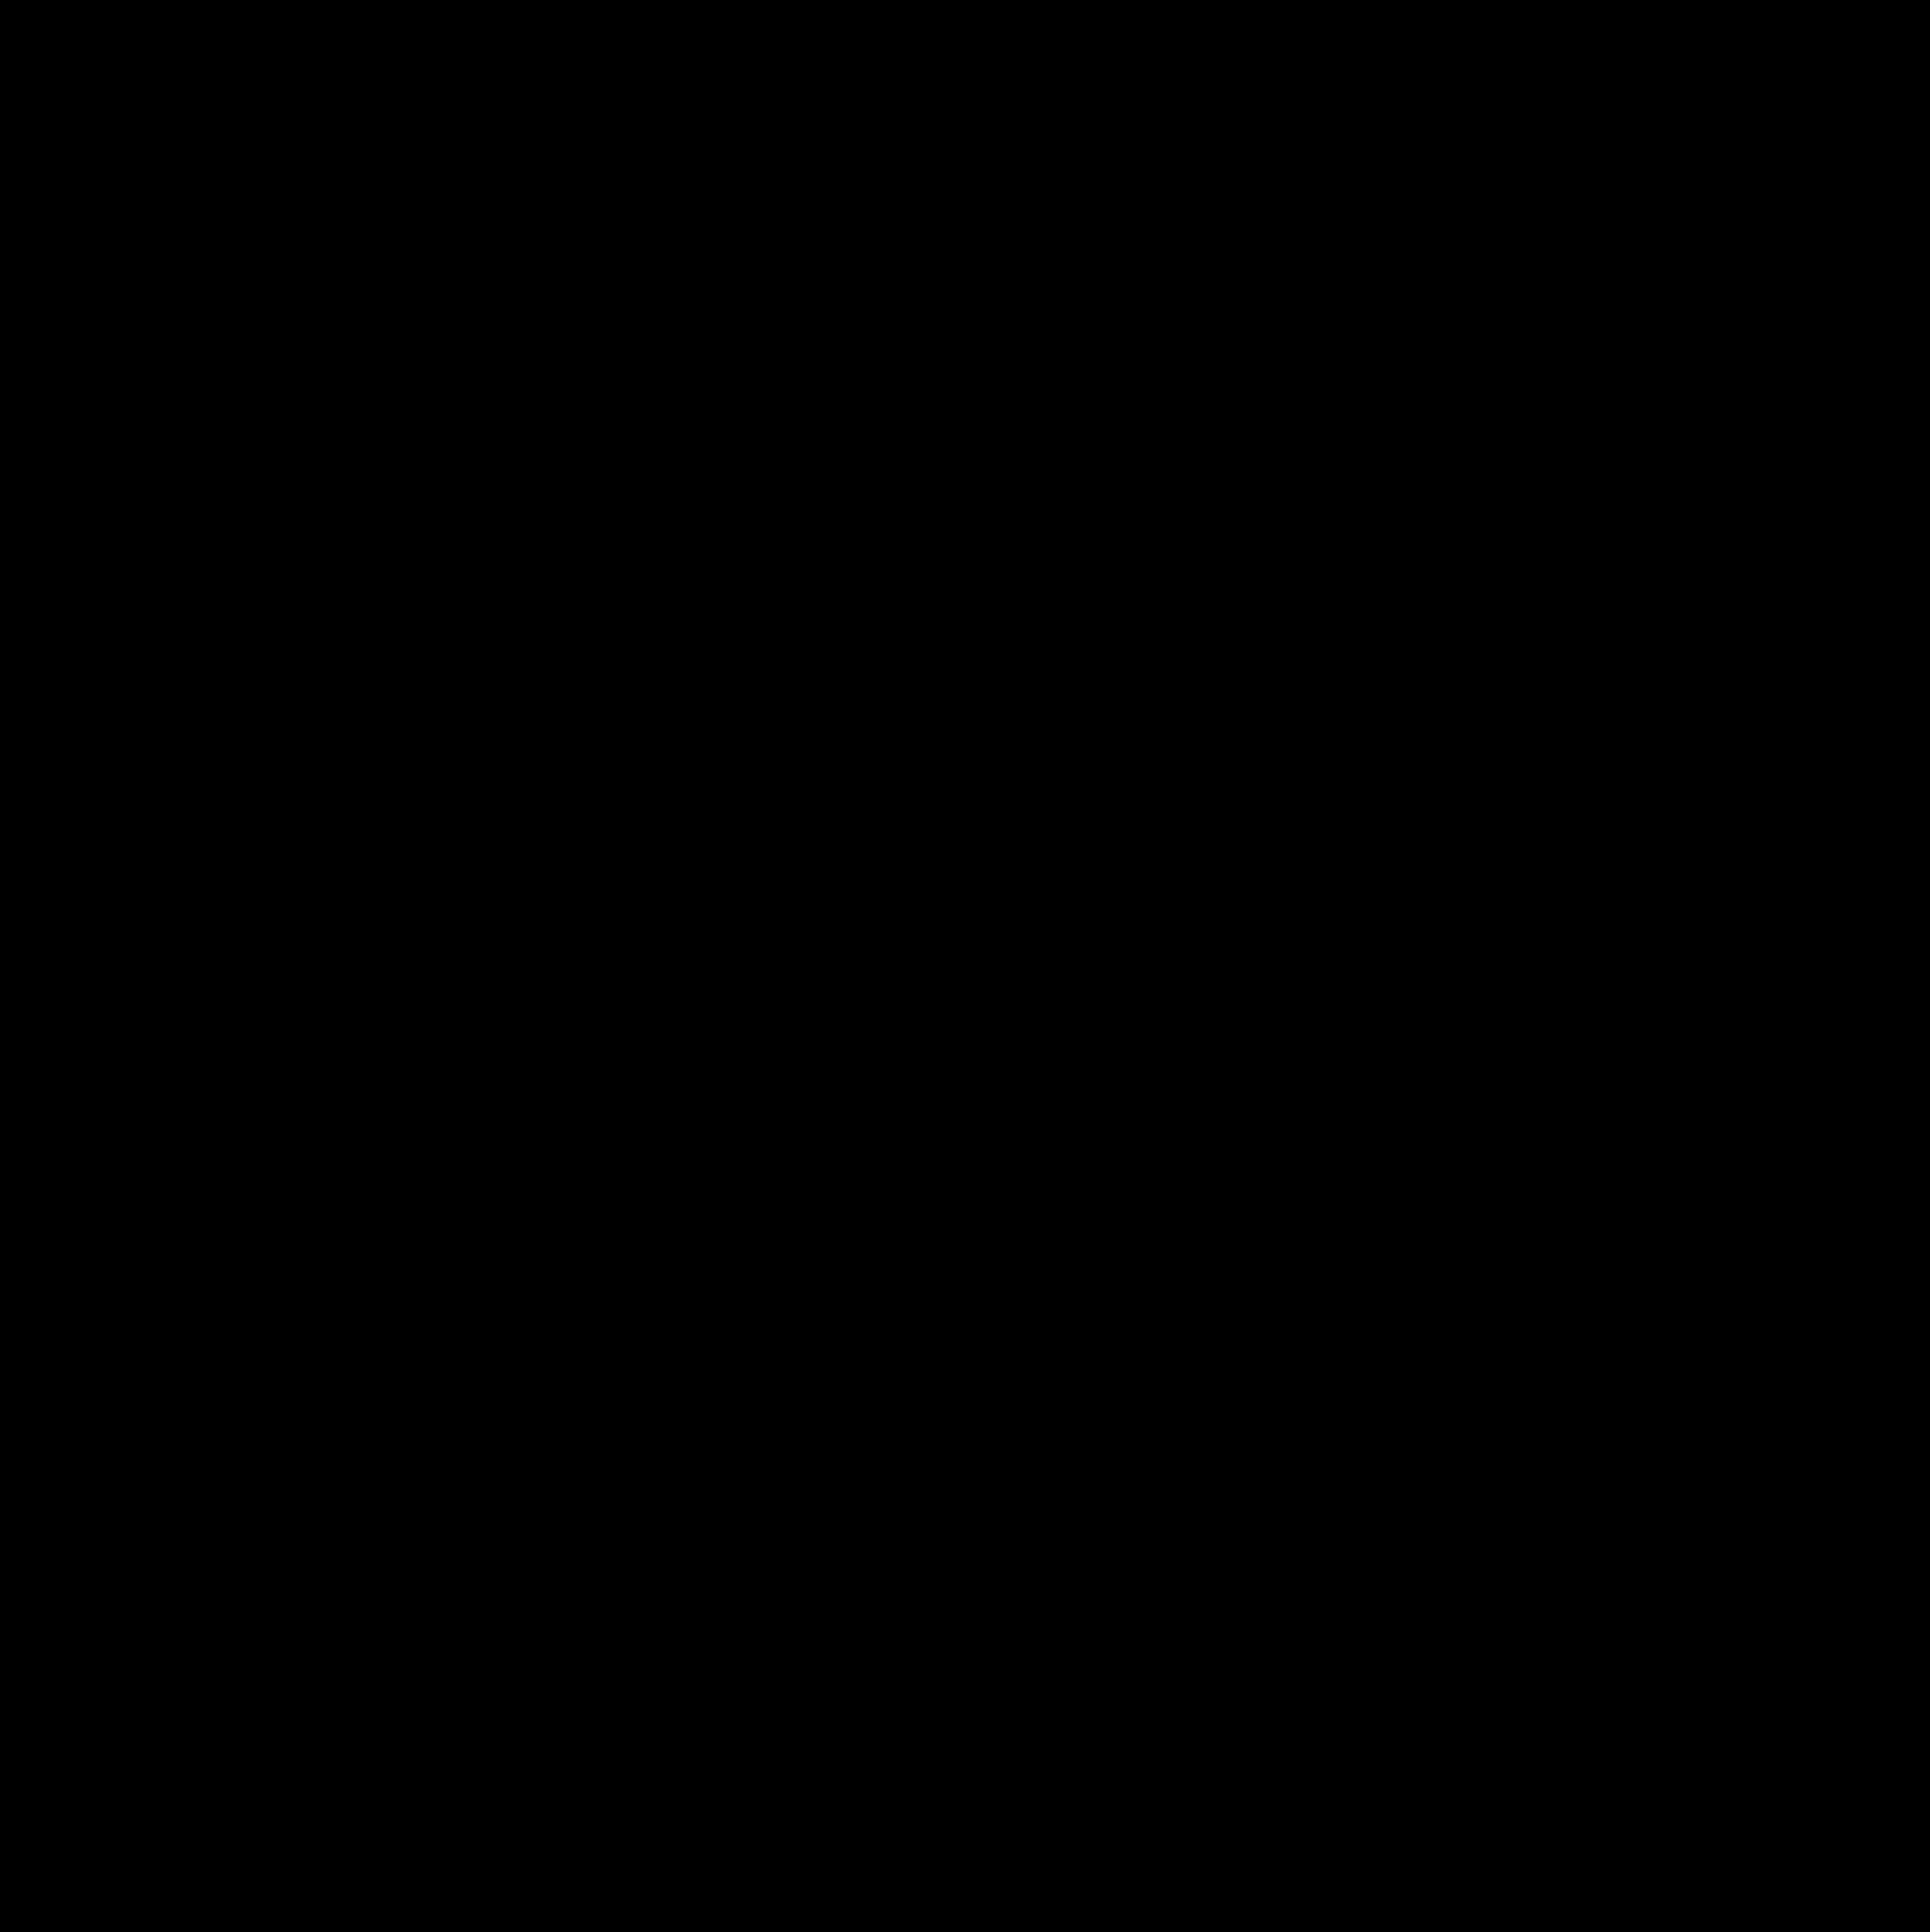 2286x2288 Kitten Clipart Line Drawing